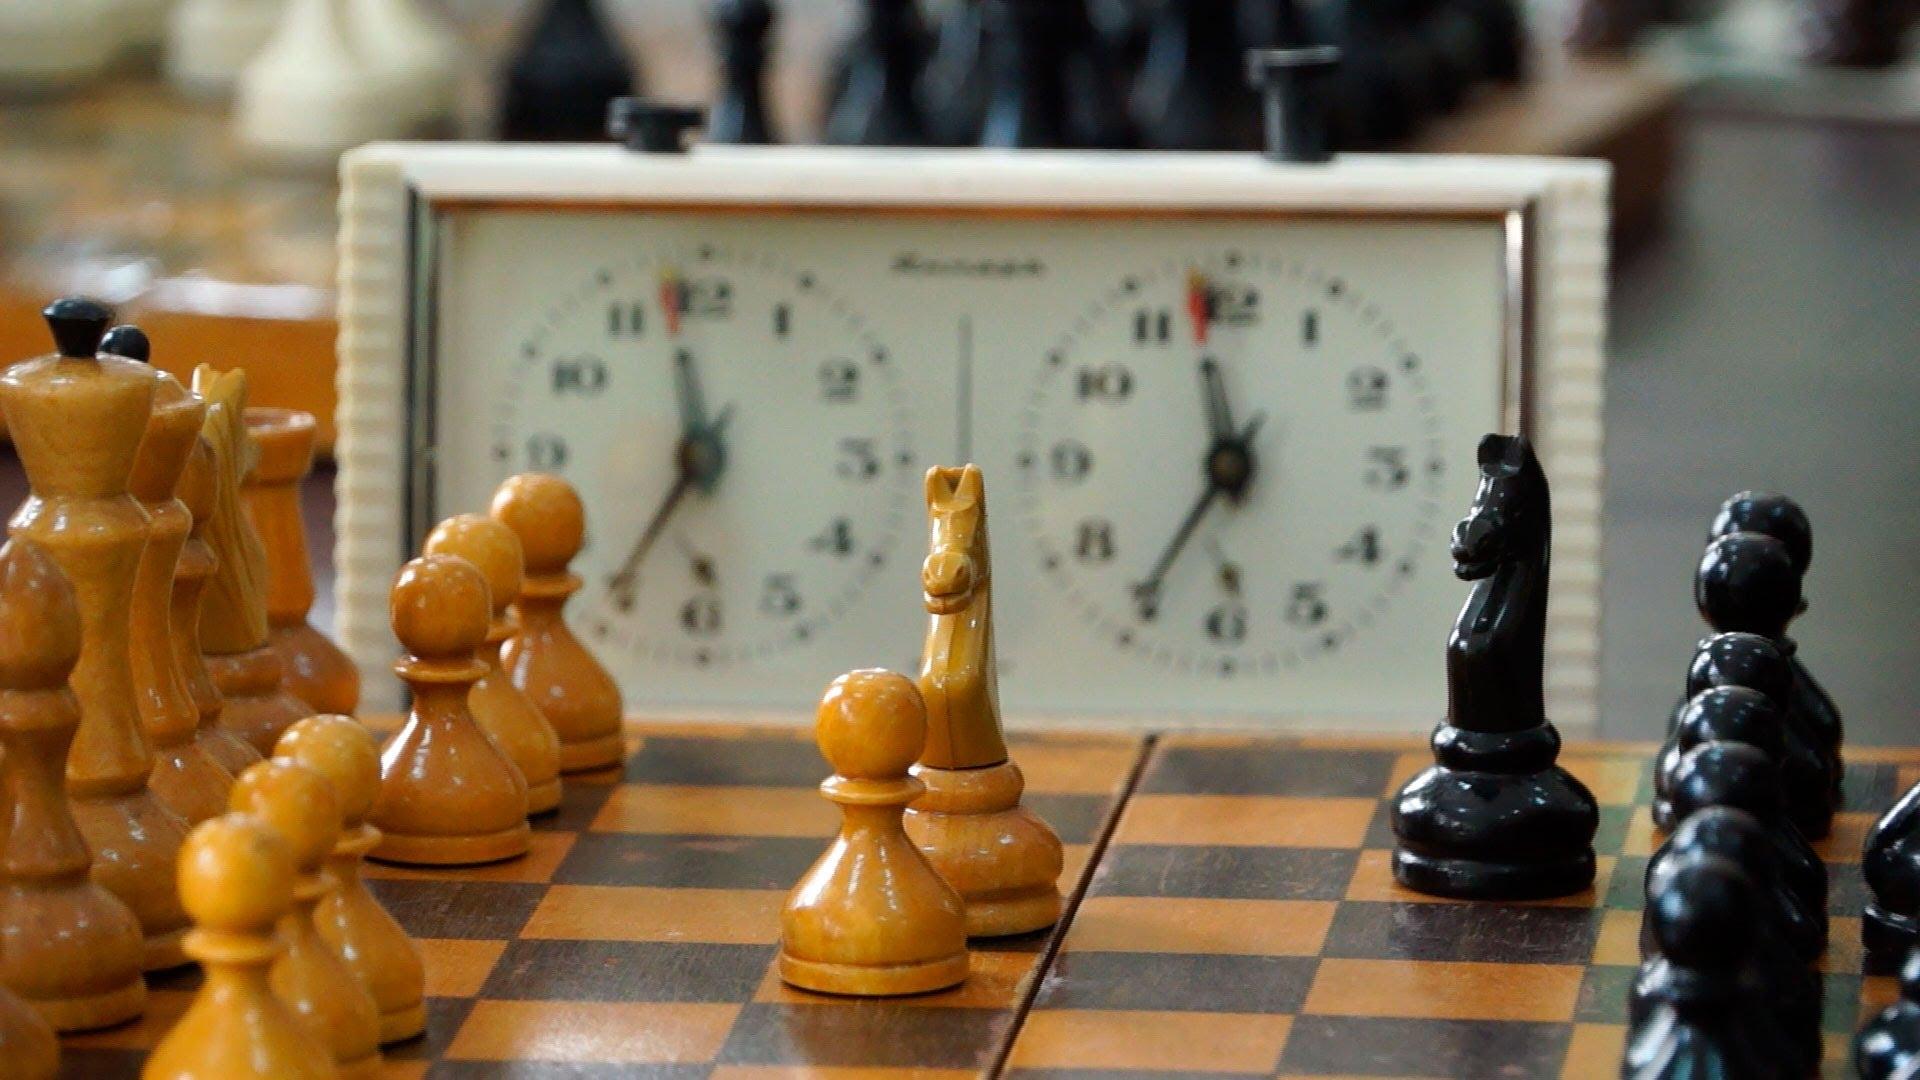 праздники картинка шахматного турнира хотел